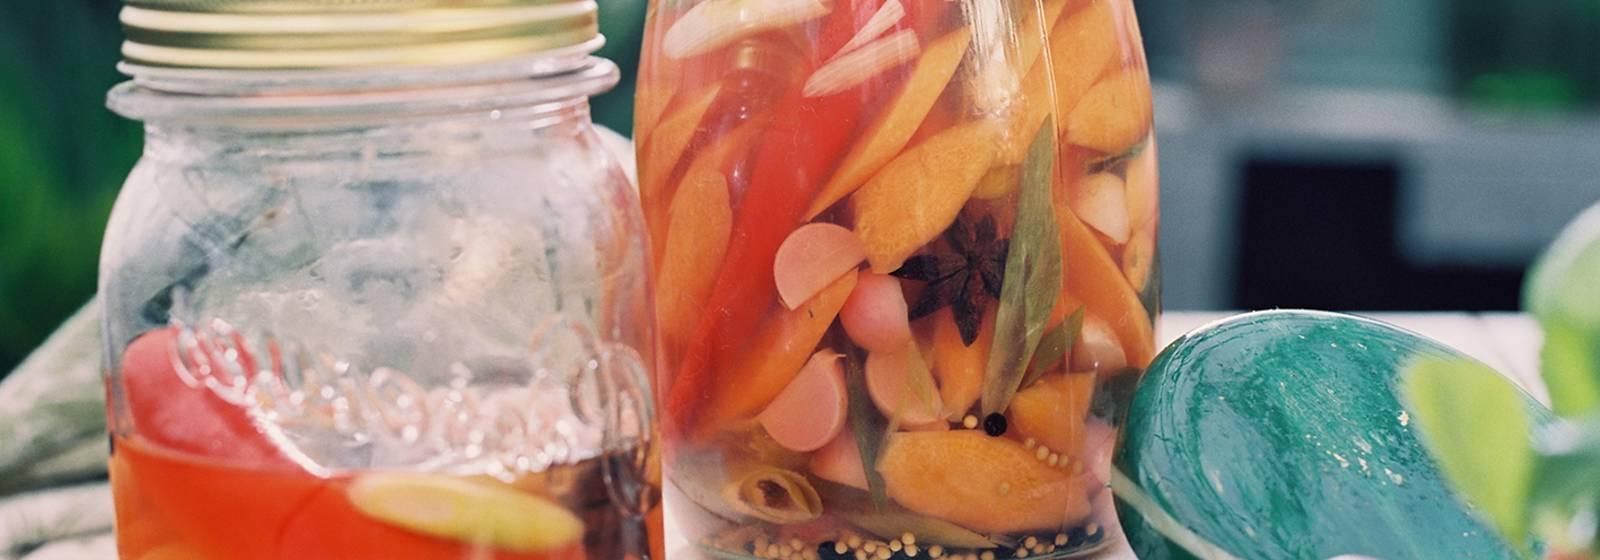 Carrot-radish pickle